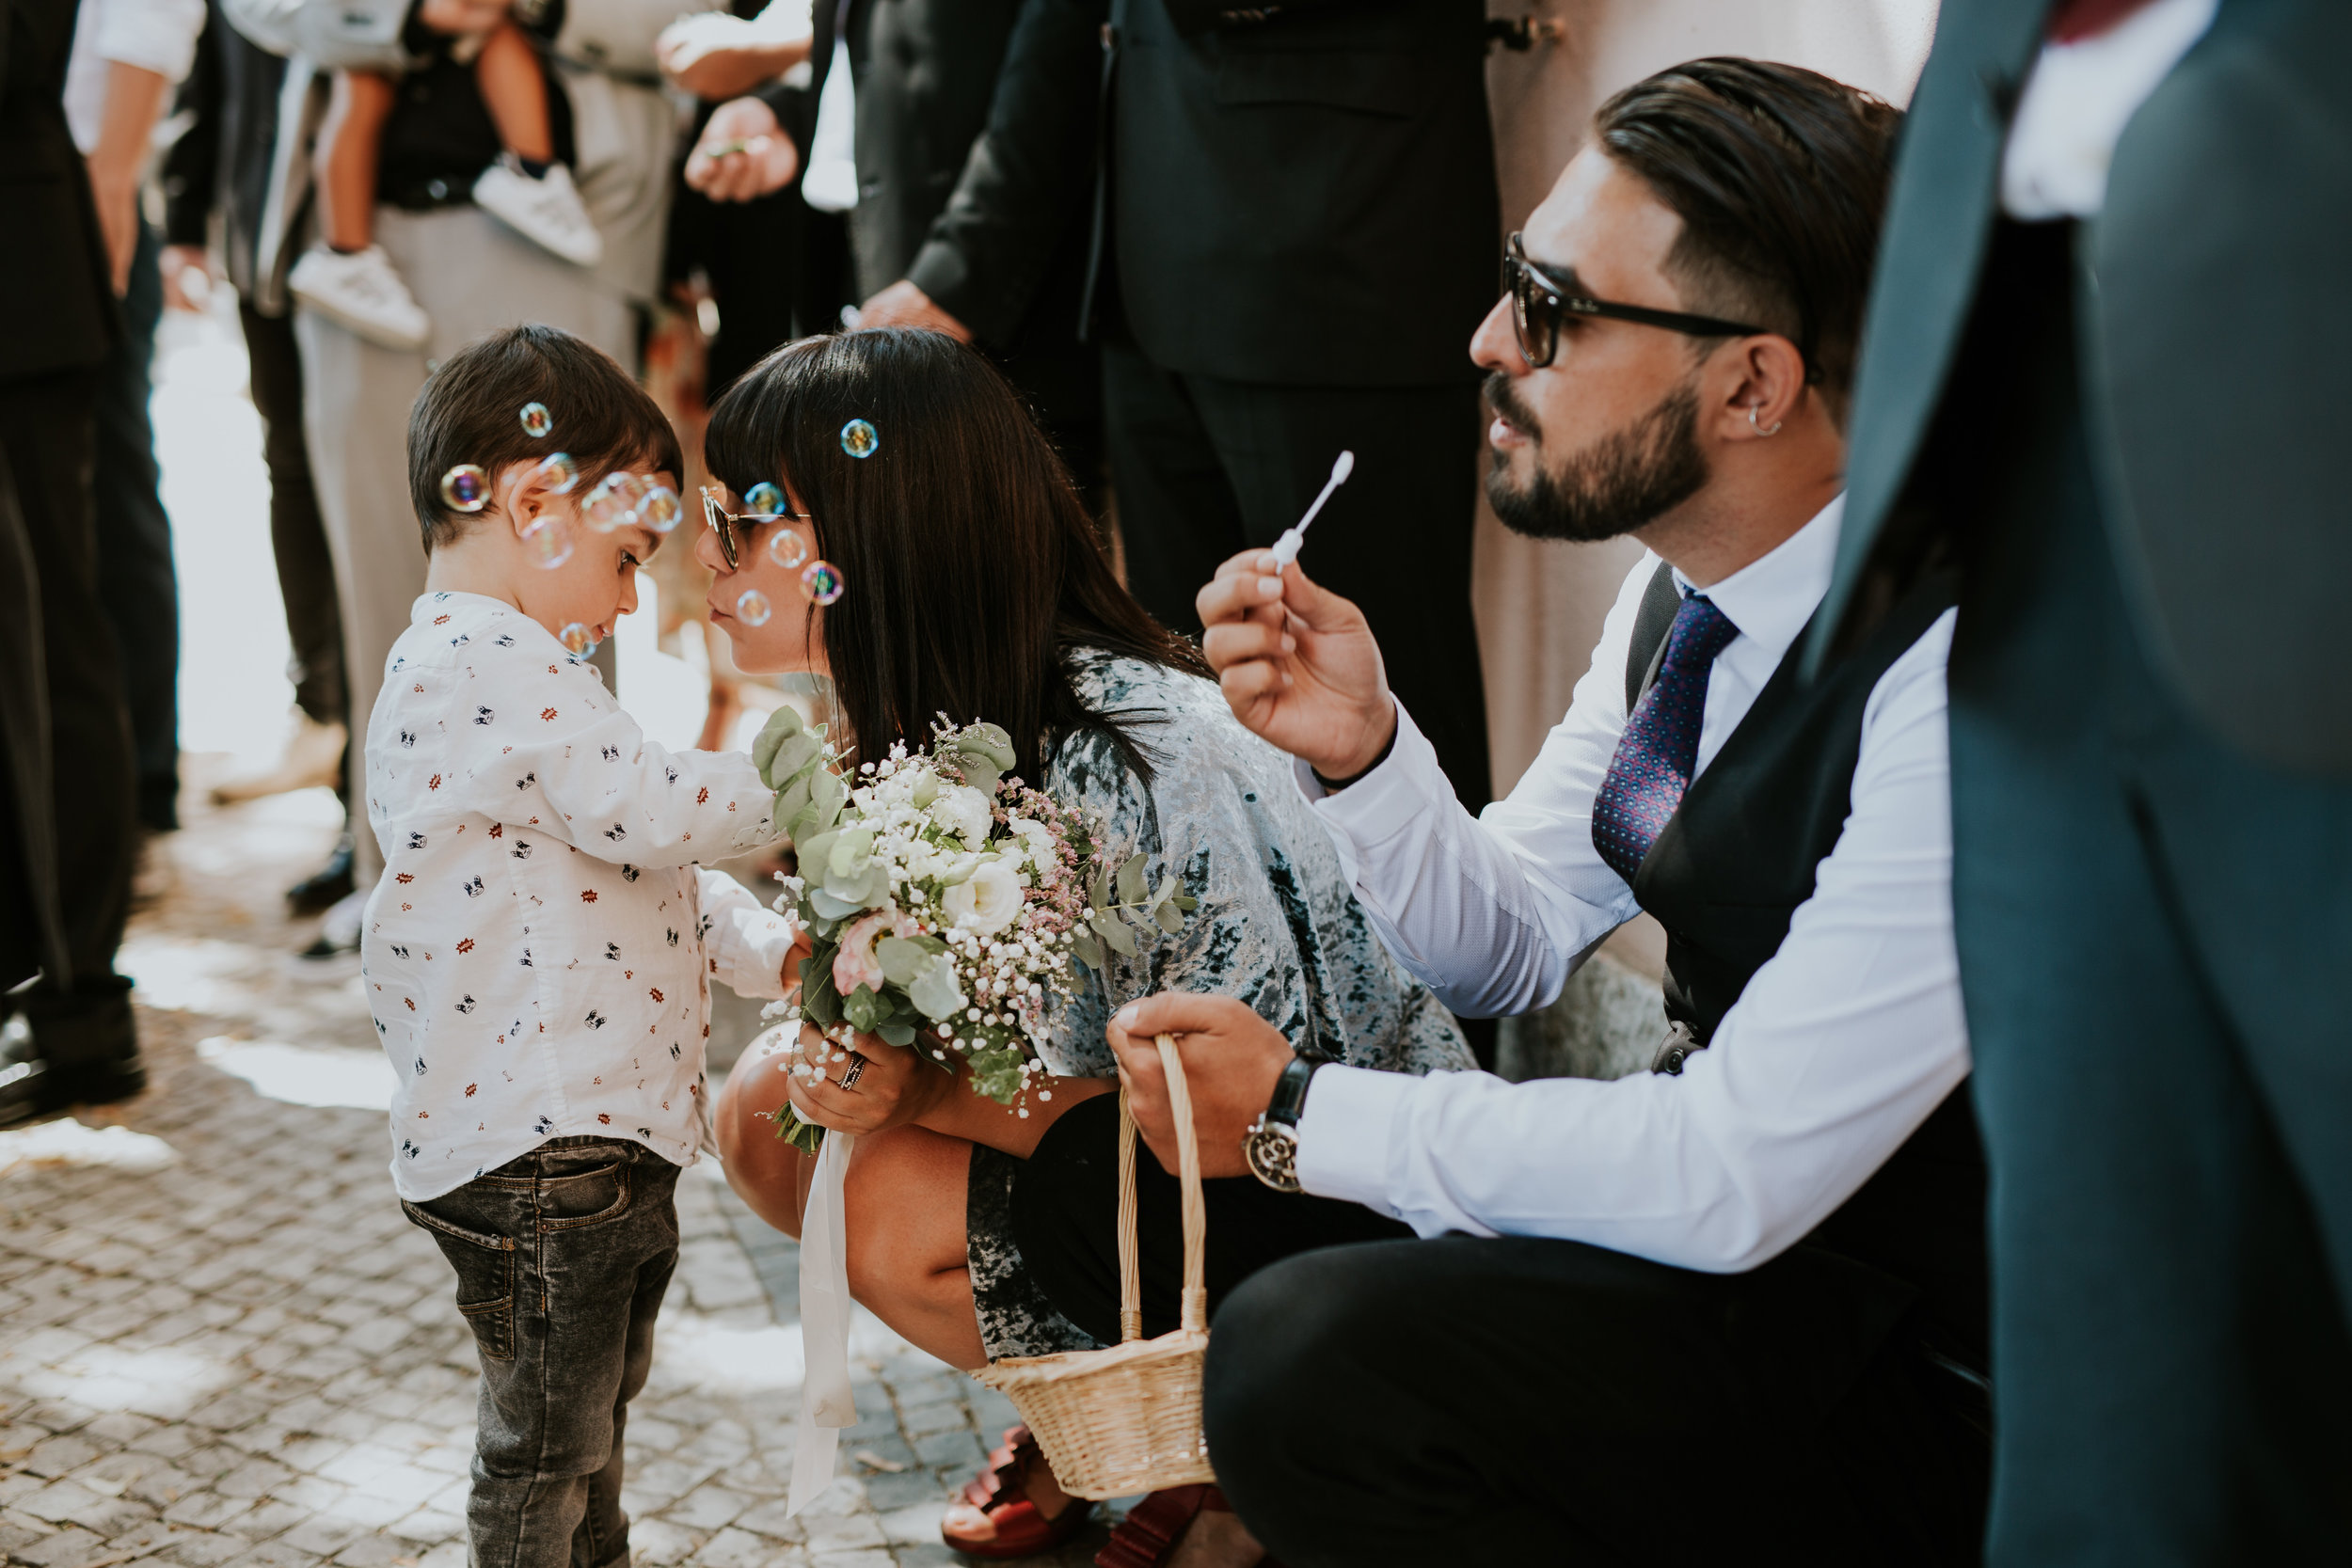 J&P 283_ 02 setembro 2017 Wedding day_.jpg